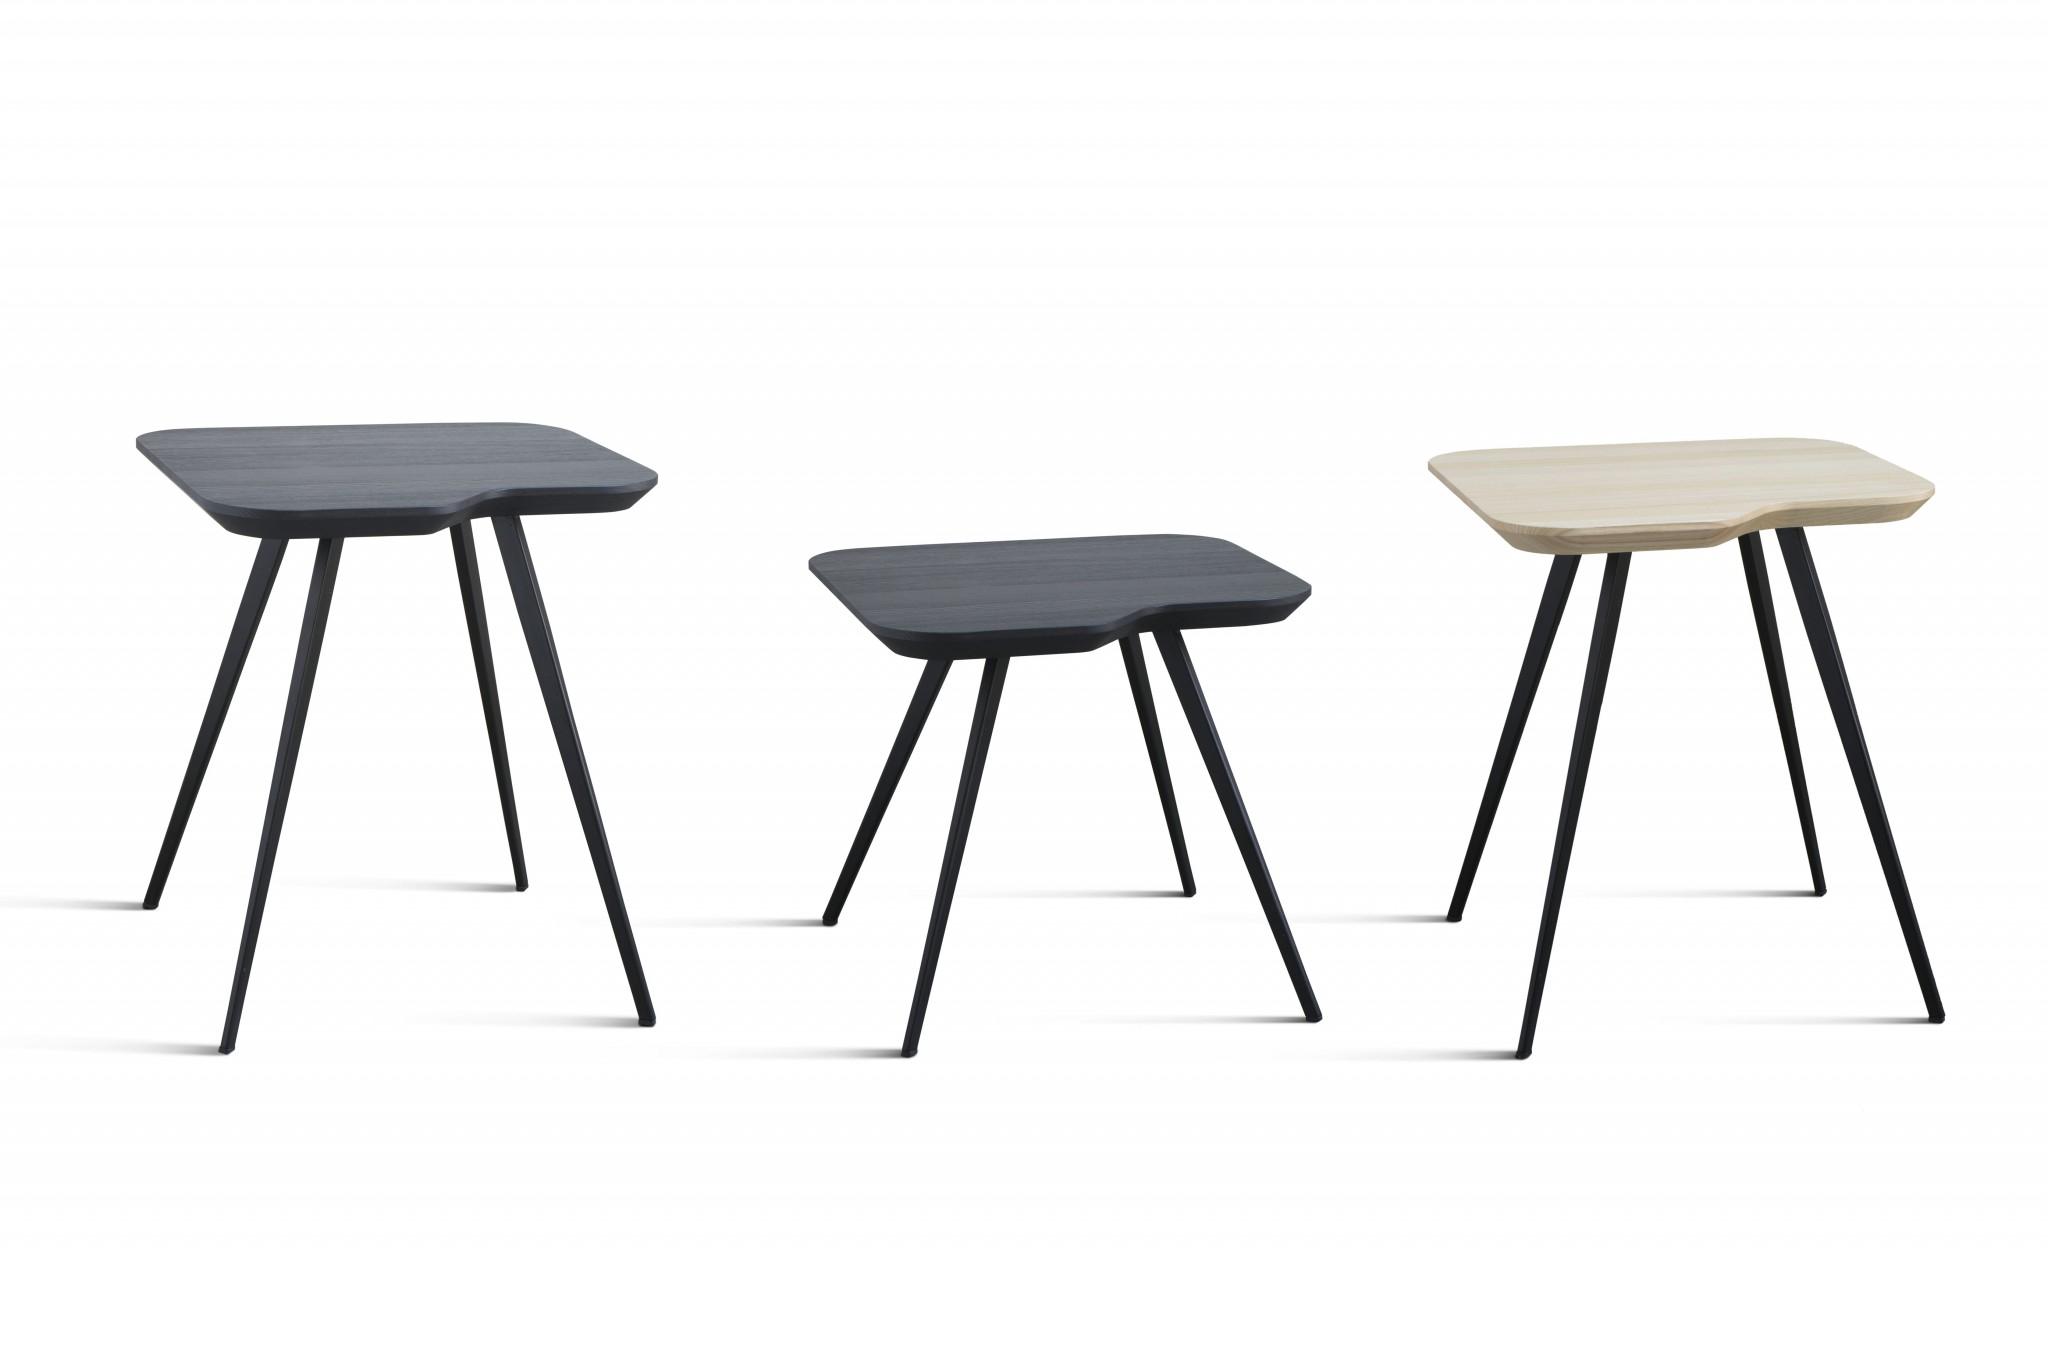 PARTICOLARE AKY SMALL TABLE MET(trio)